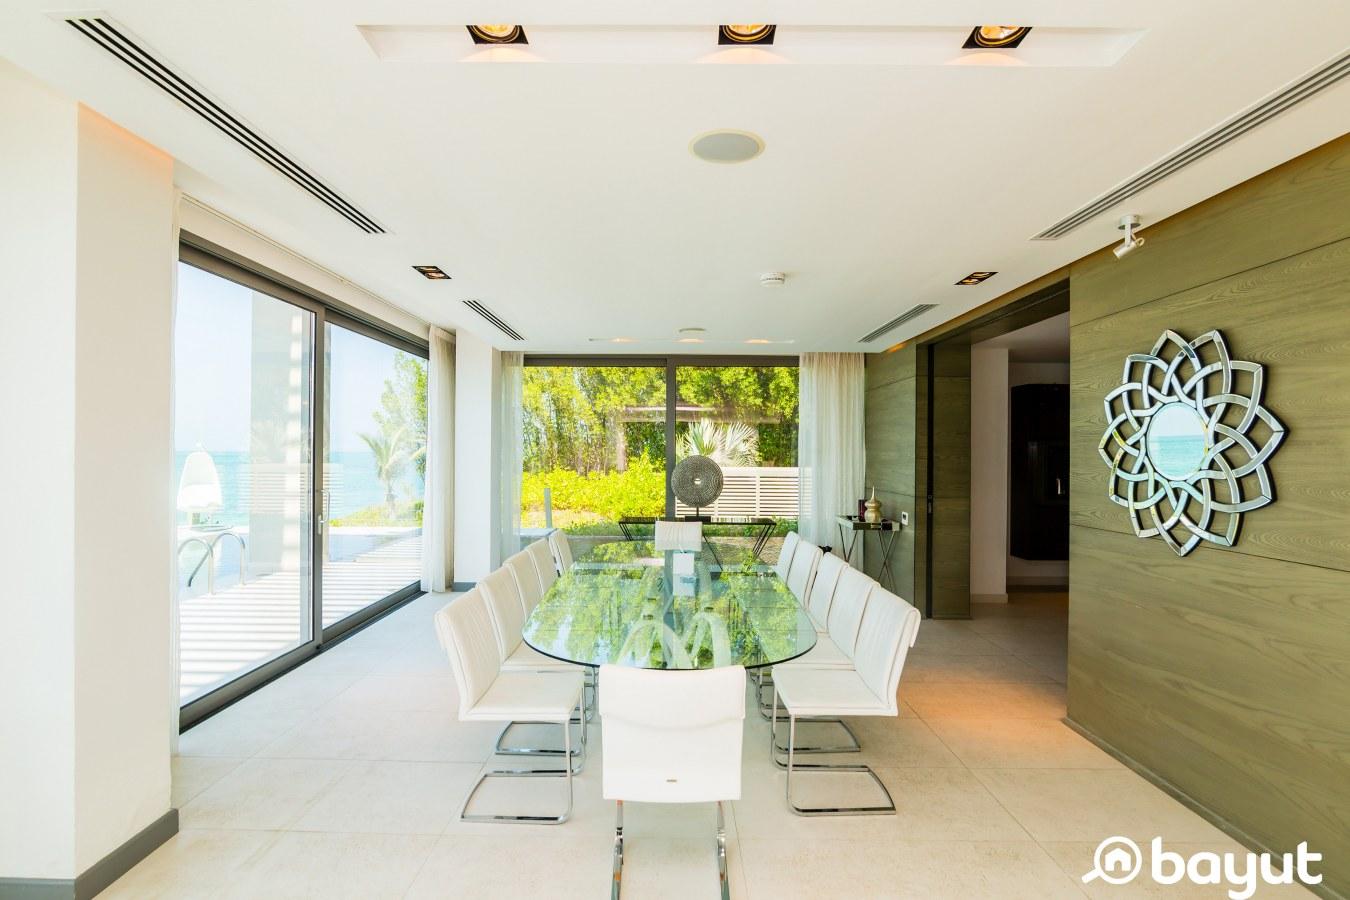 dining room in a 4-bedroom villa in nurai island abu dhabi